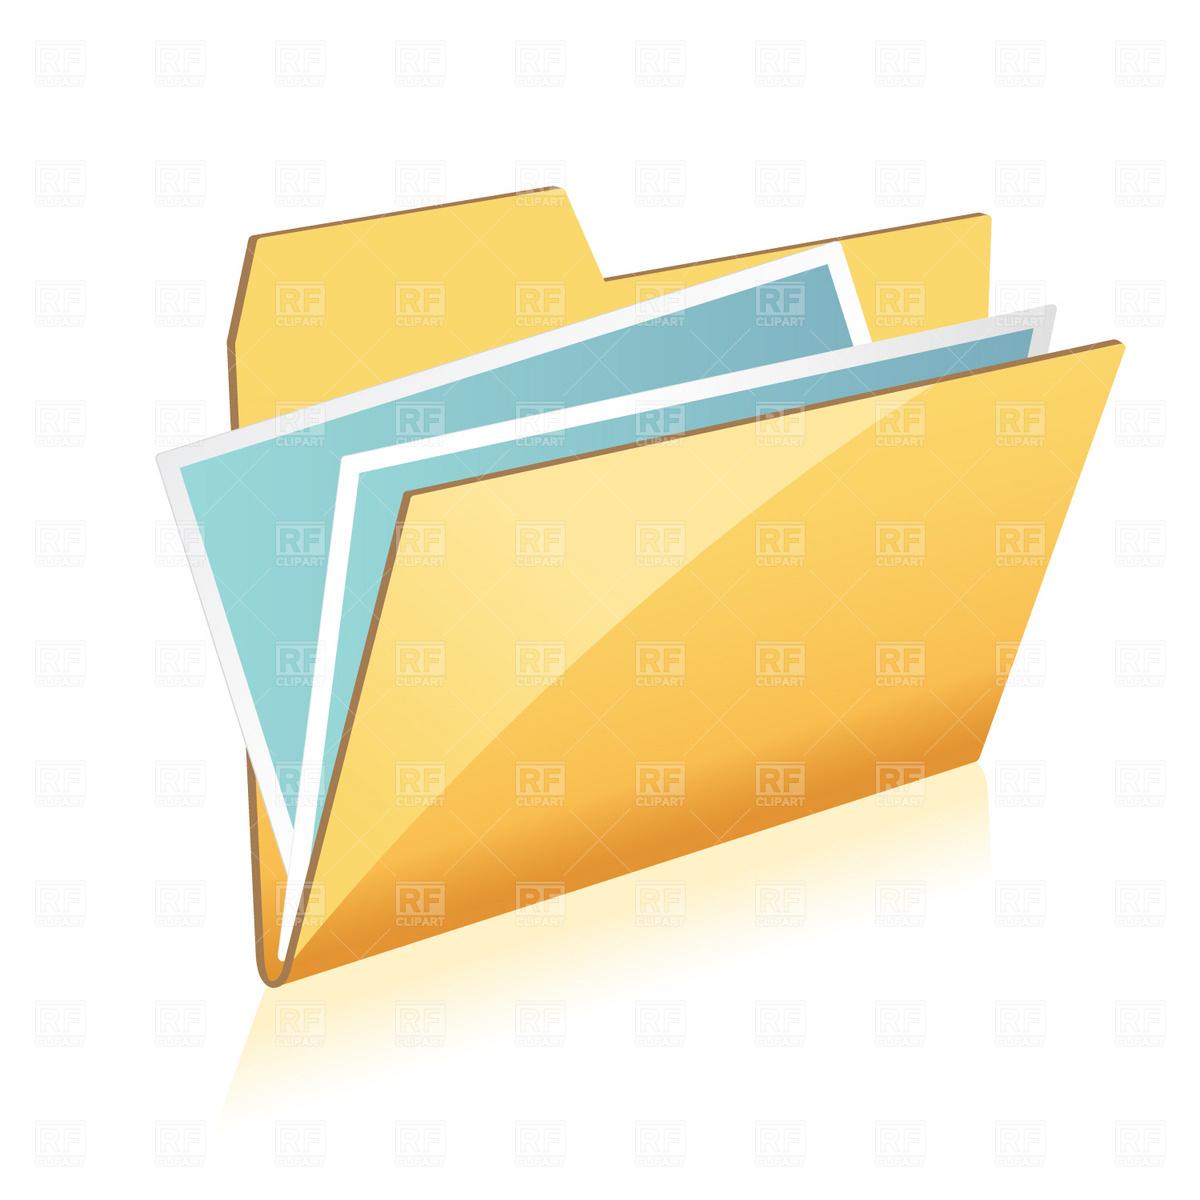 12 File Folder Icon Images